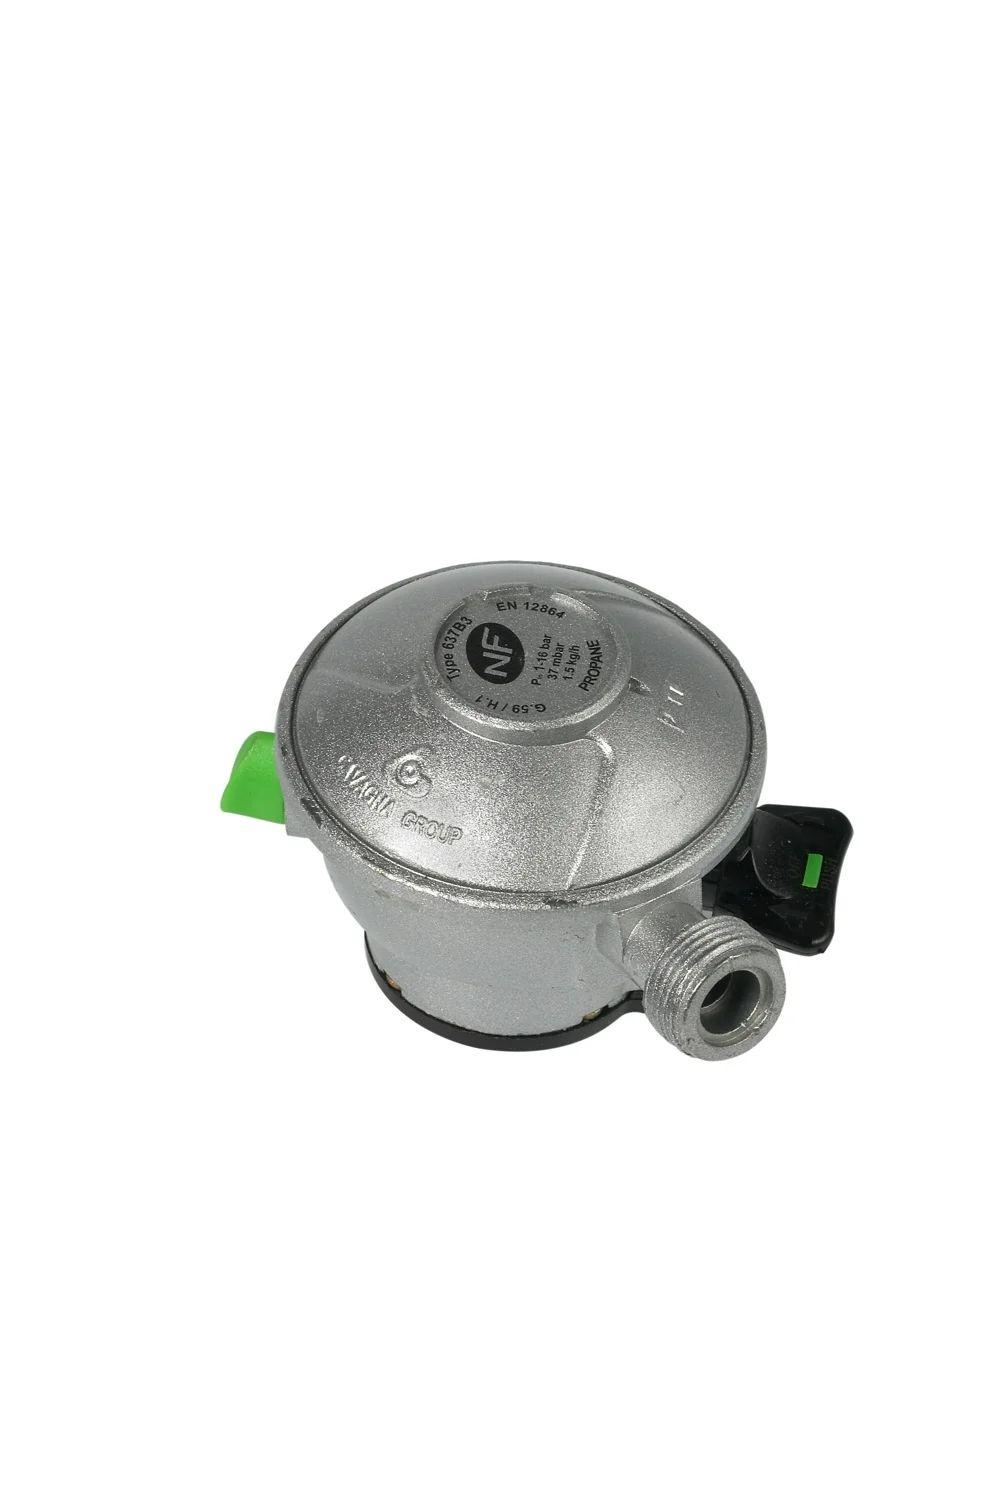 Detendeur Inox Gaz Propane 5 H 6 5 Cm Gazinox Leroy Merlin